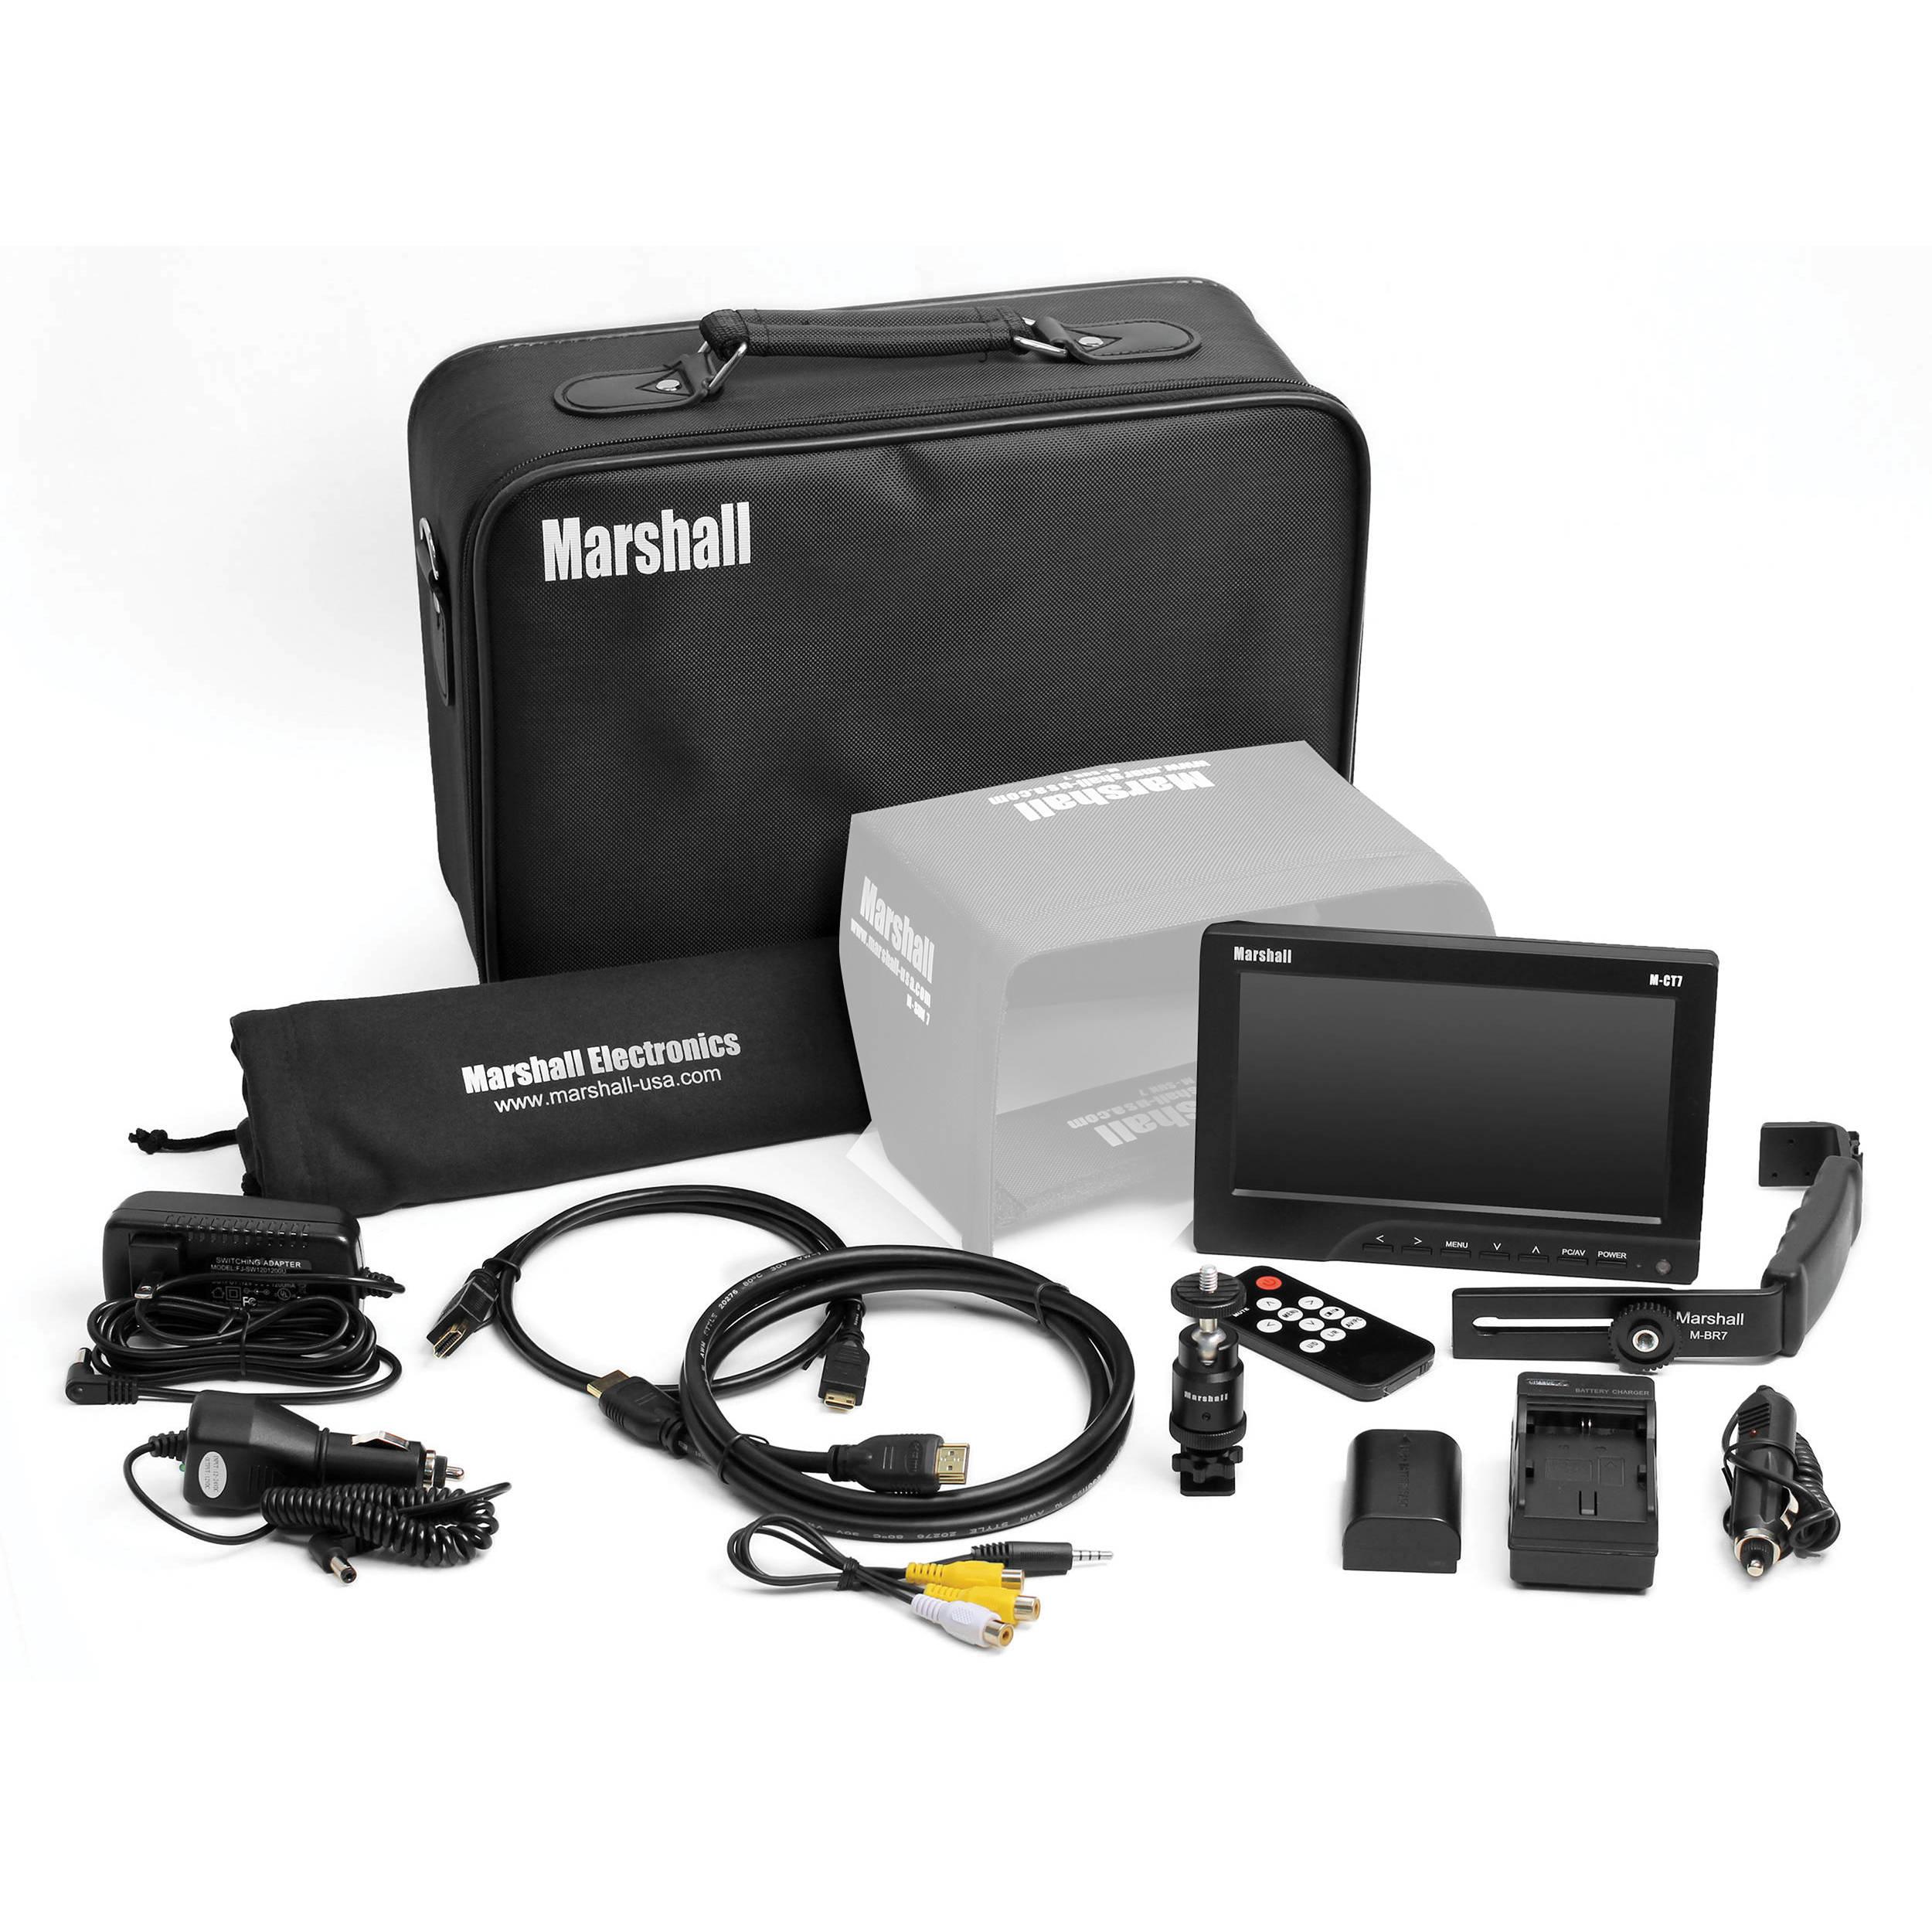 M Bel Marshall marshall electronics m ct7 7 quot portable top m ct7e